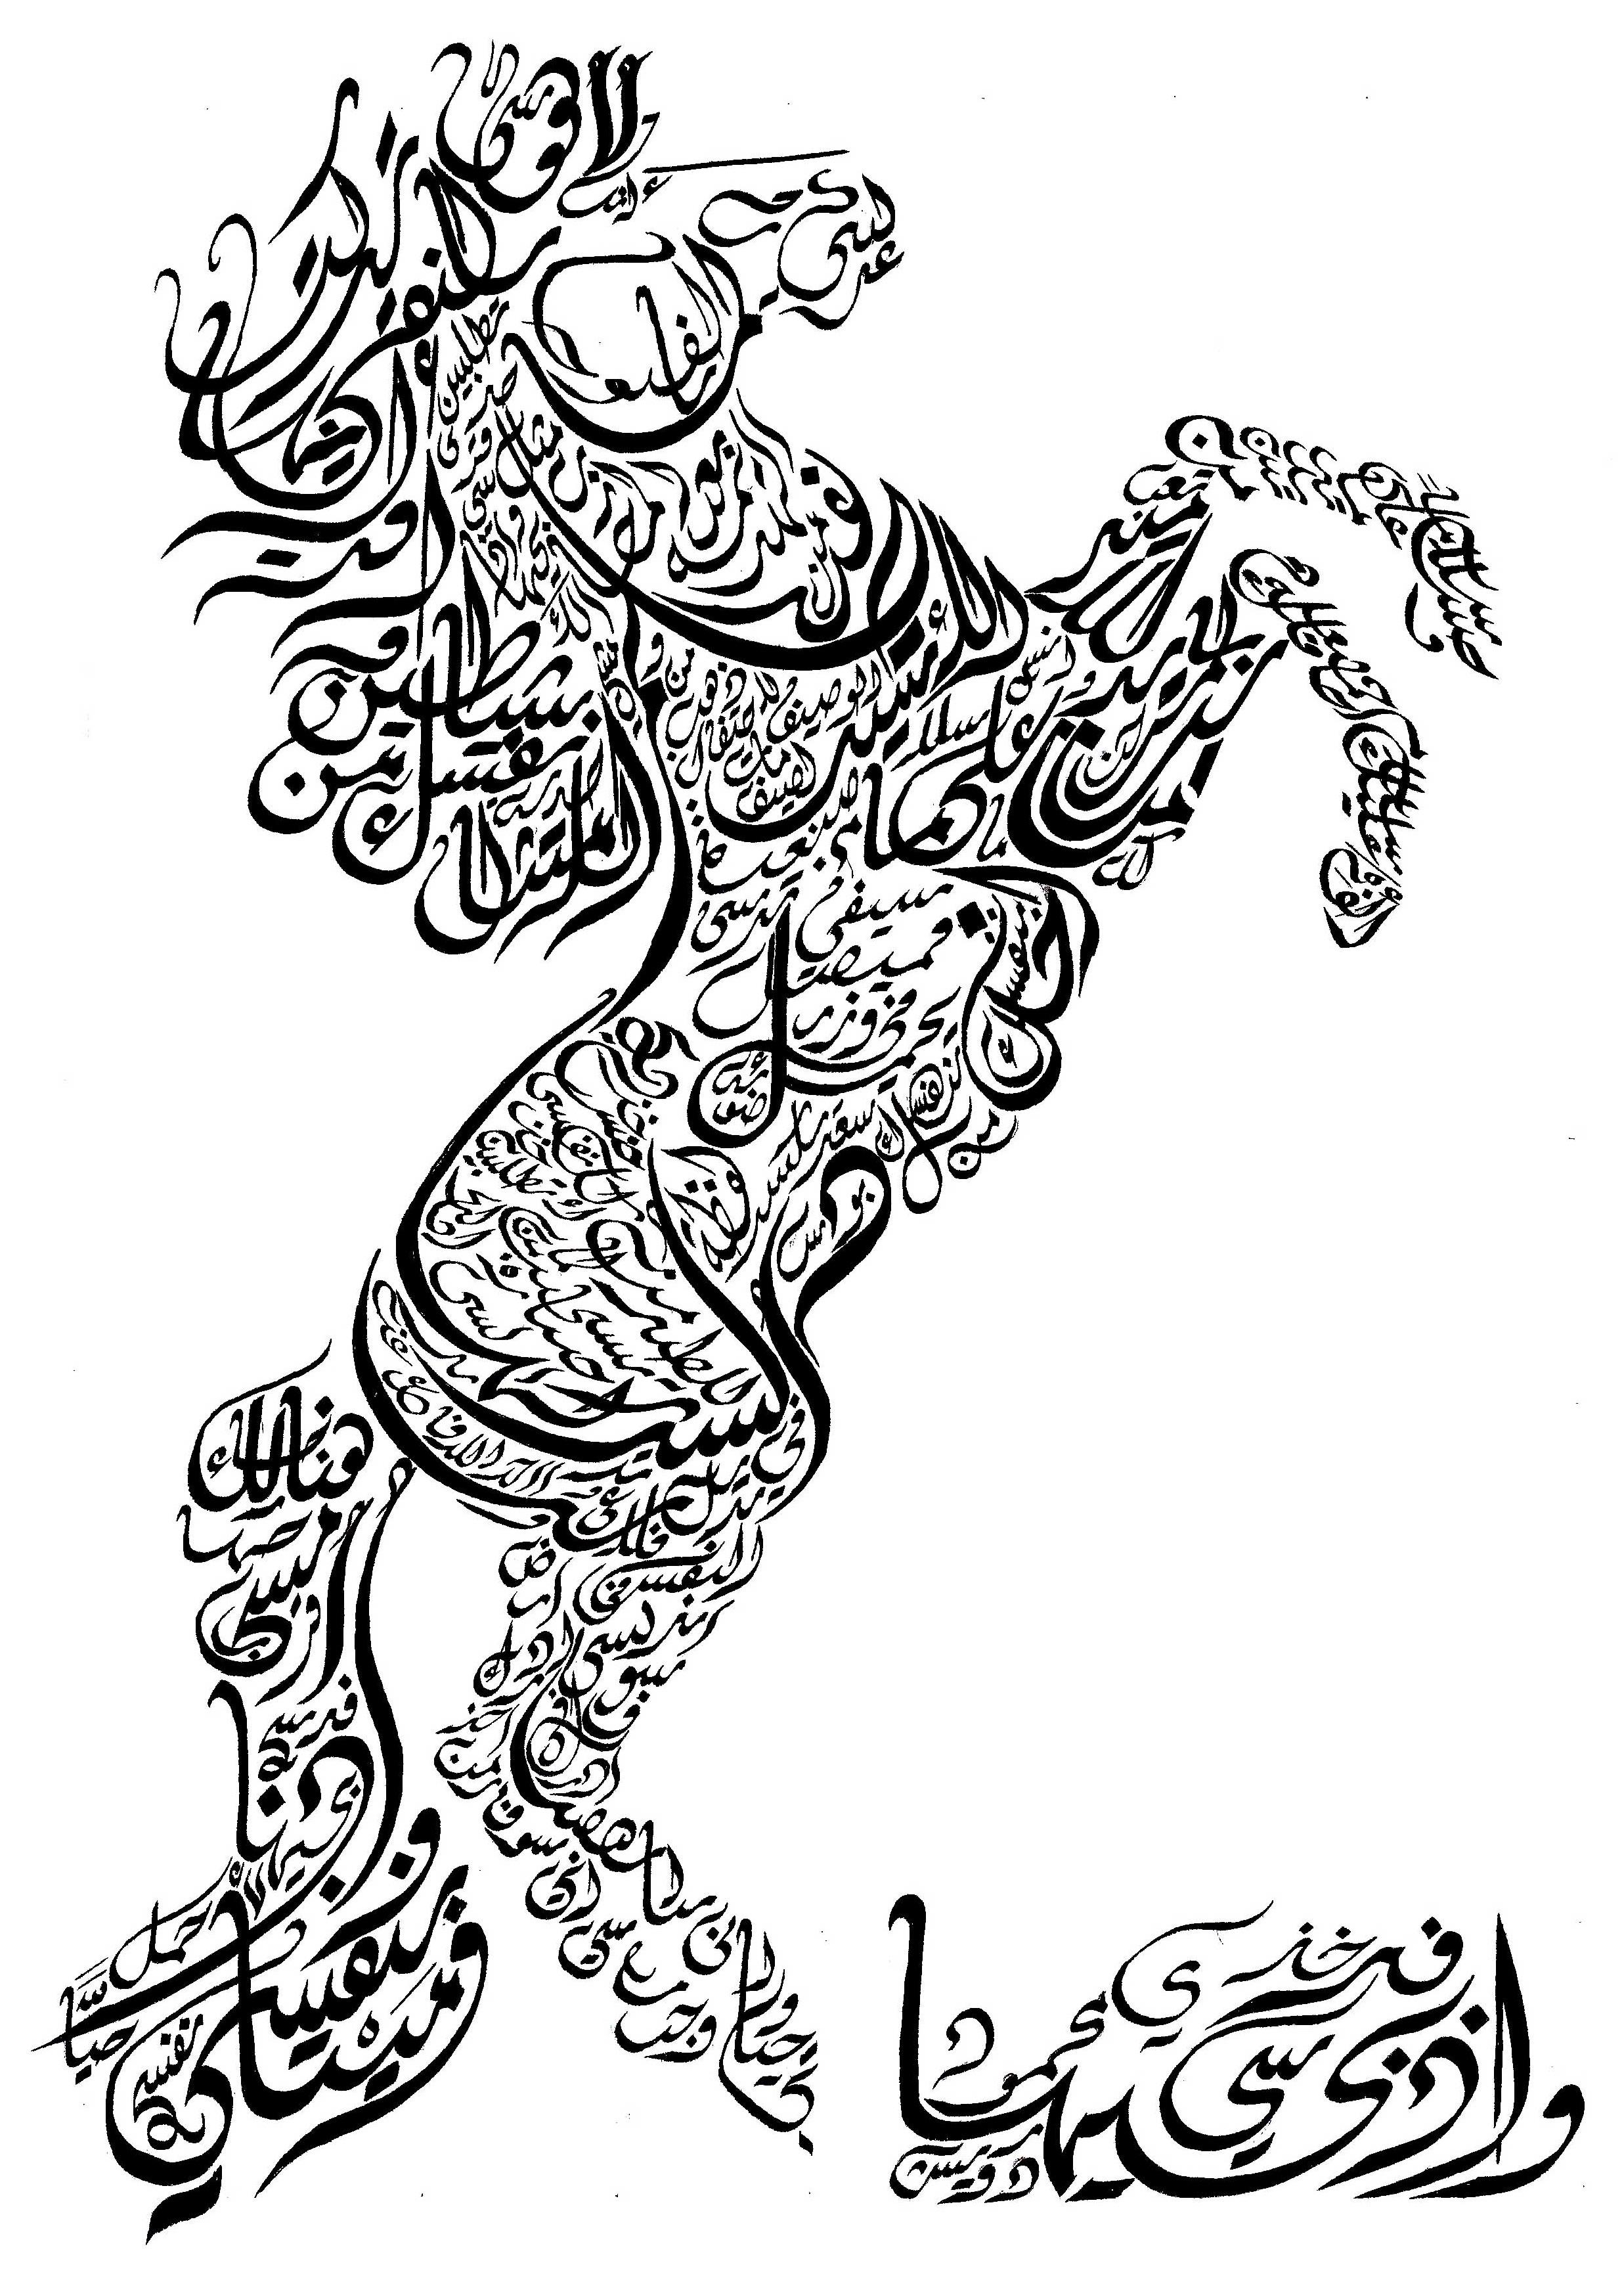 Everitte, calligraphe des USA à Beyrouth